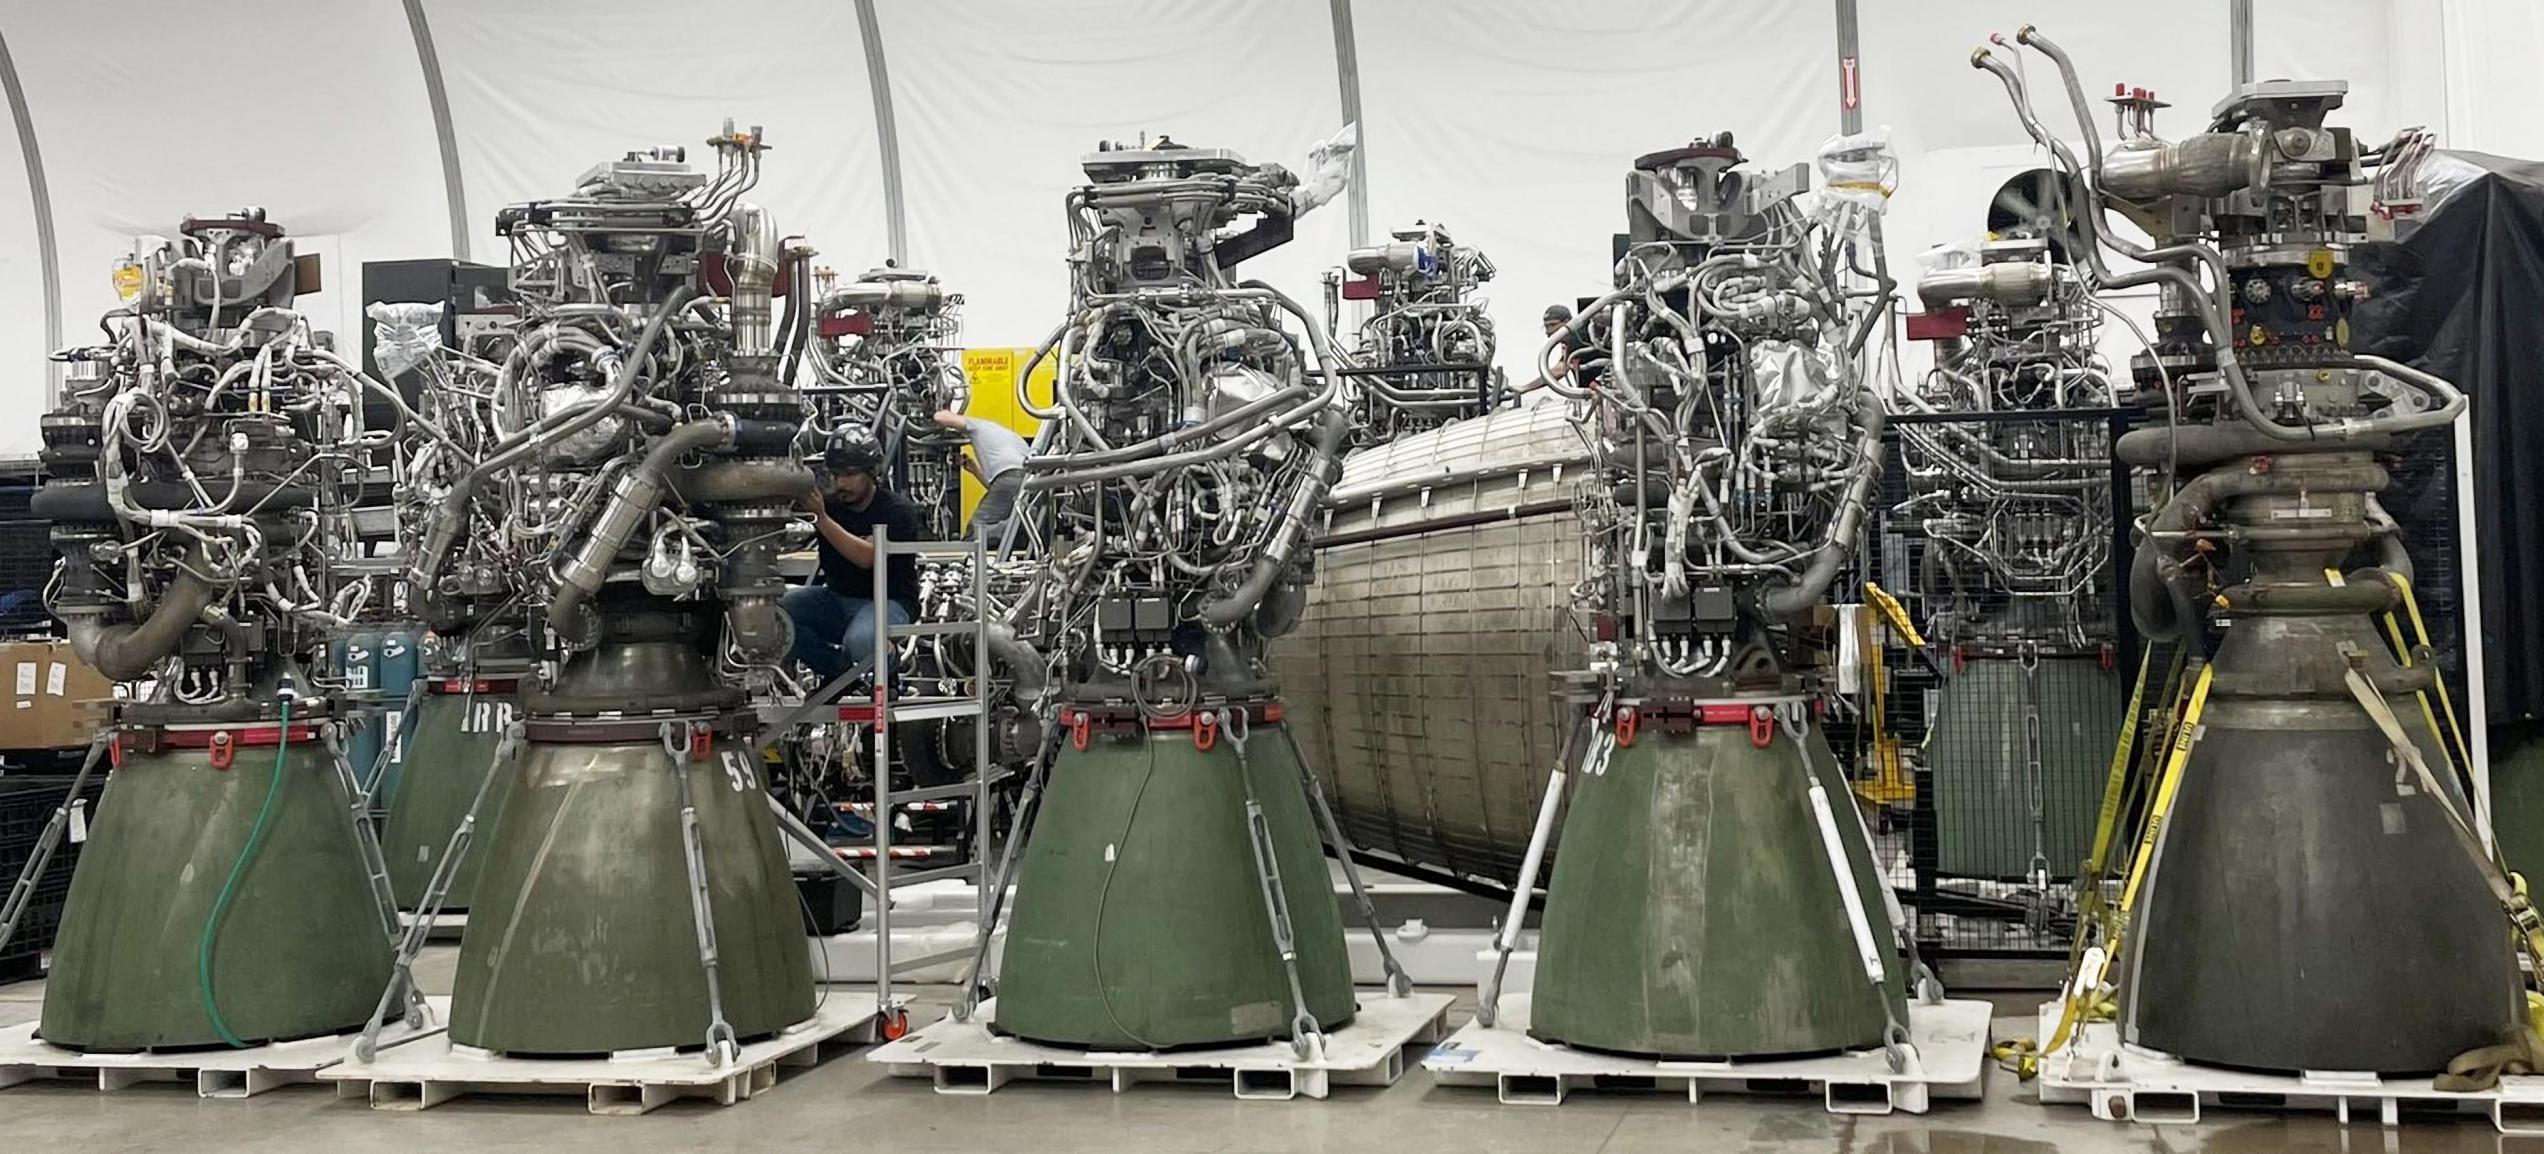 Starship Boca Chica Raptor engines (Elon Musk) 1 2X (c)